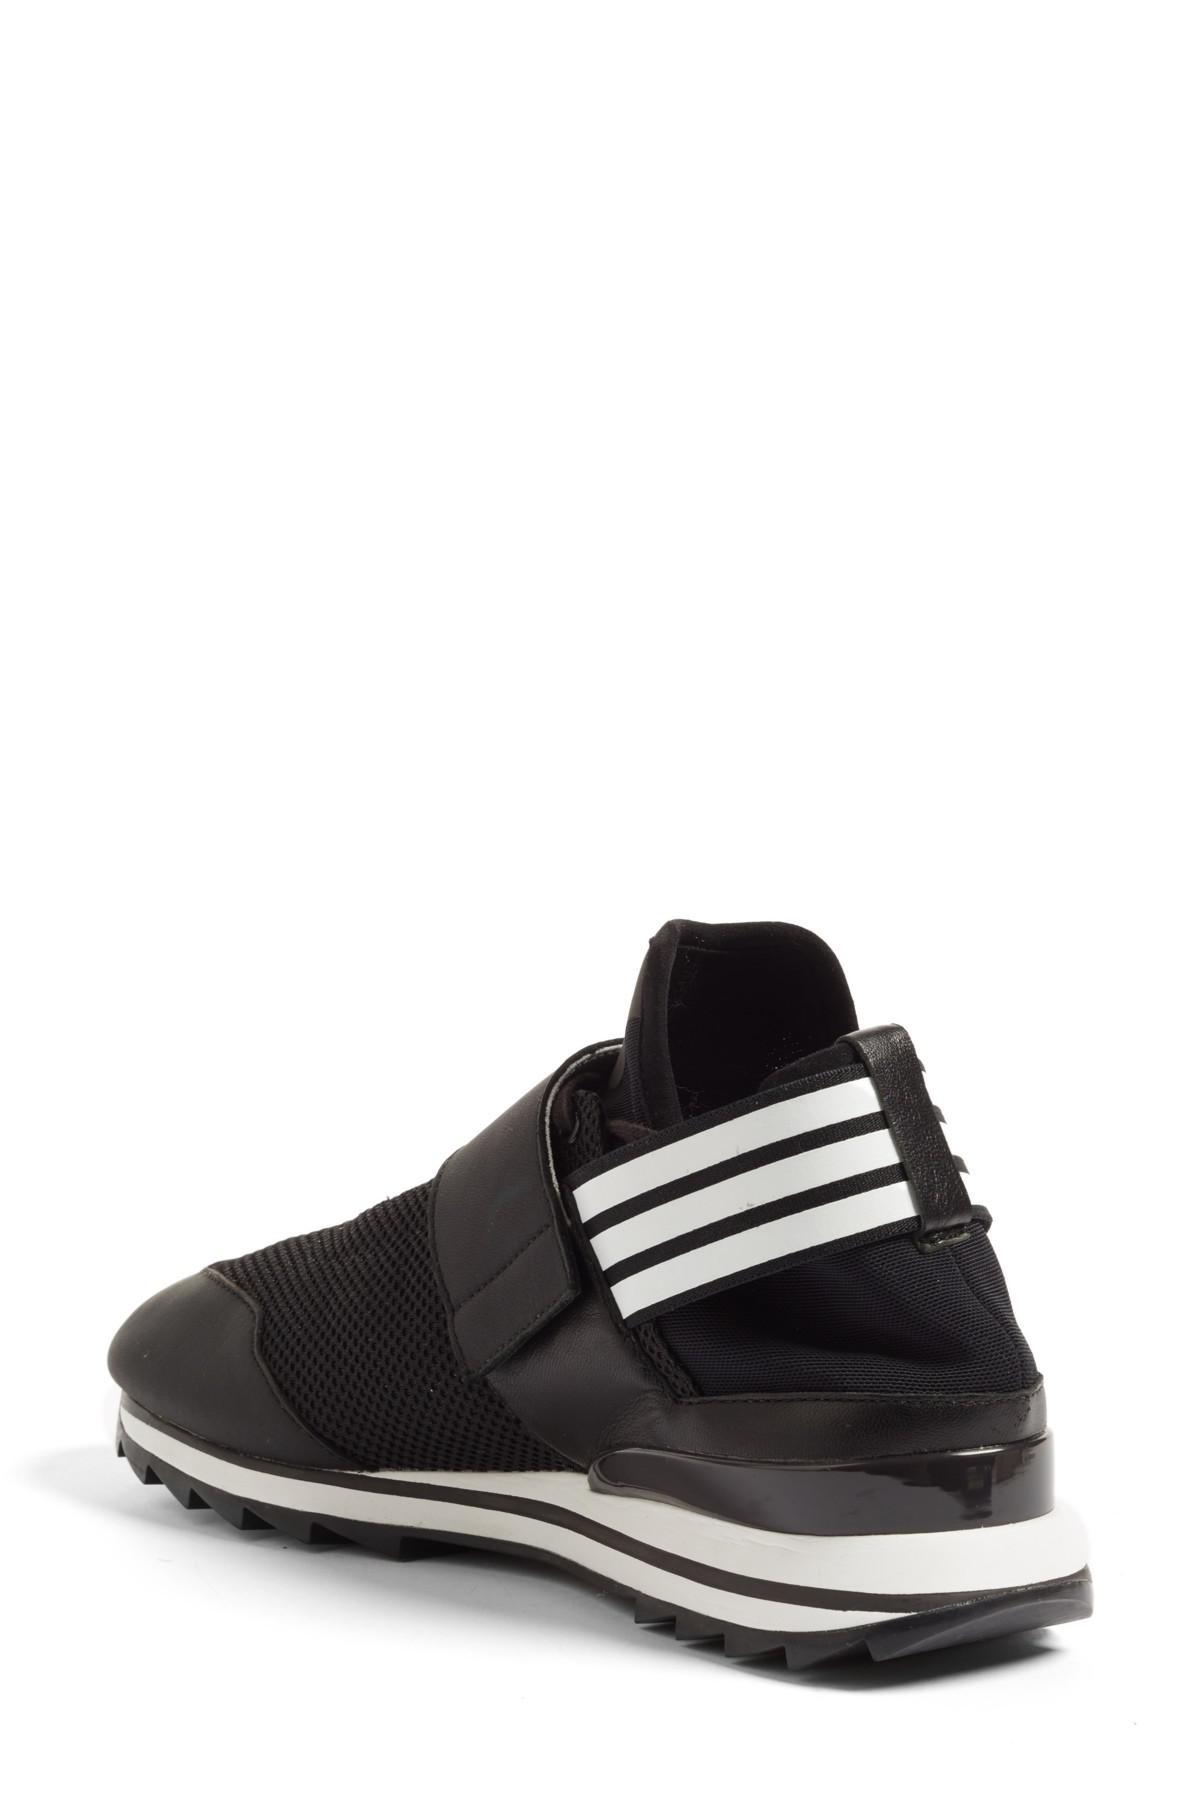 2216d97731ca Lyst - Y-3 Atira Sneaker in Black